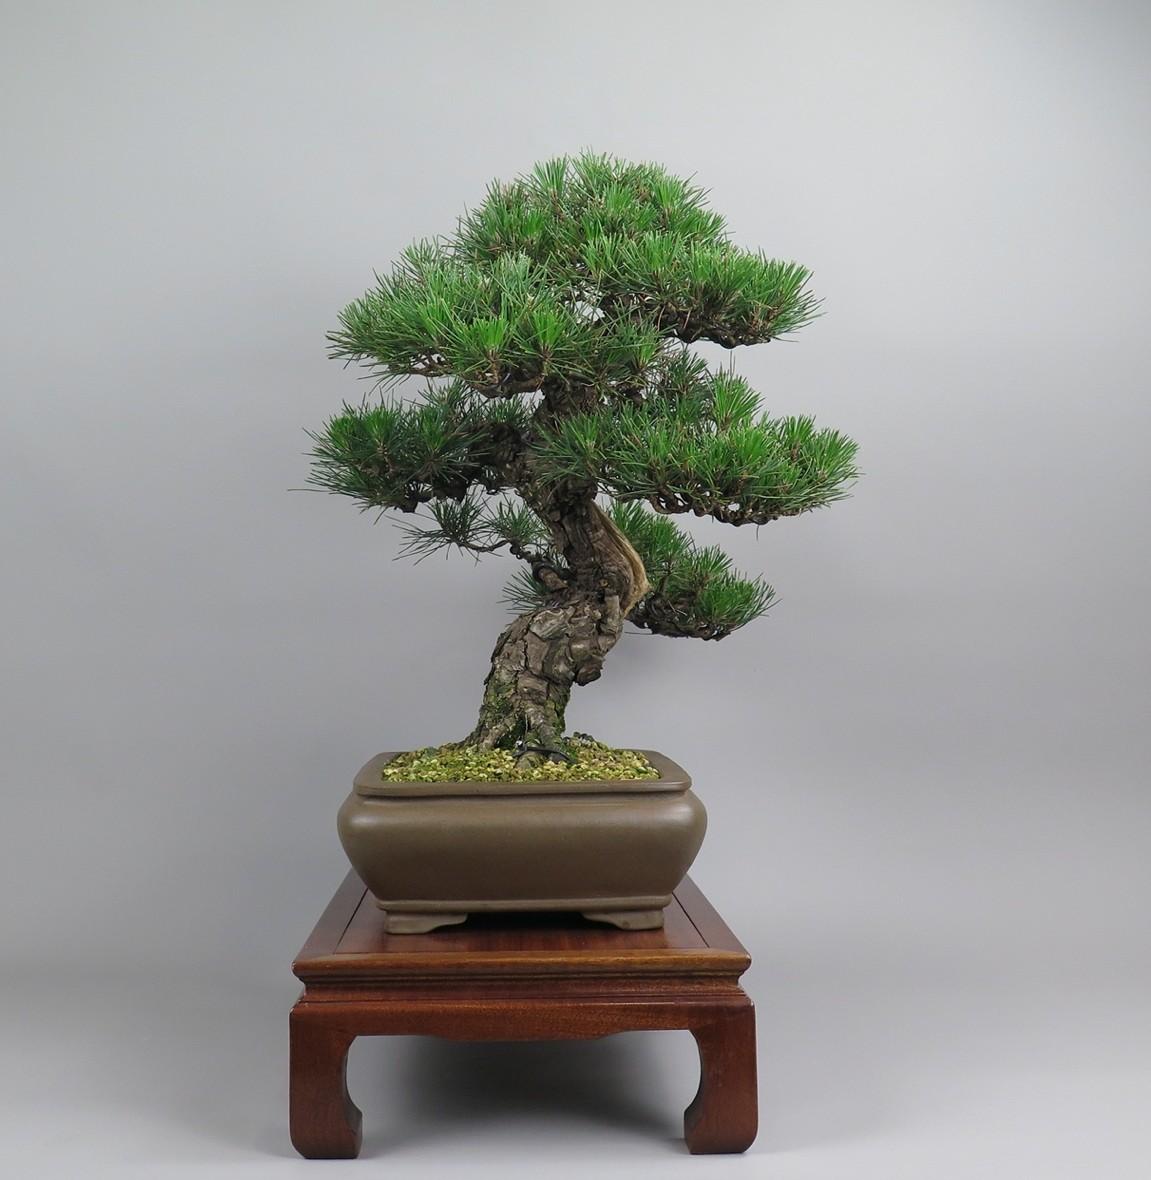 Bonsai de Pinus tumbergii, lateral derecho.